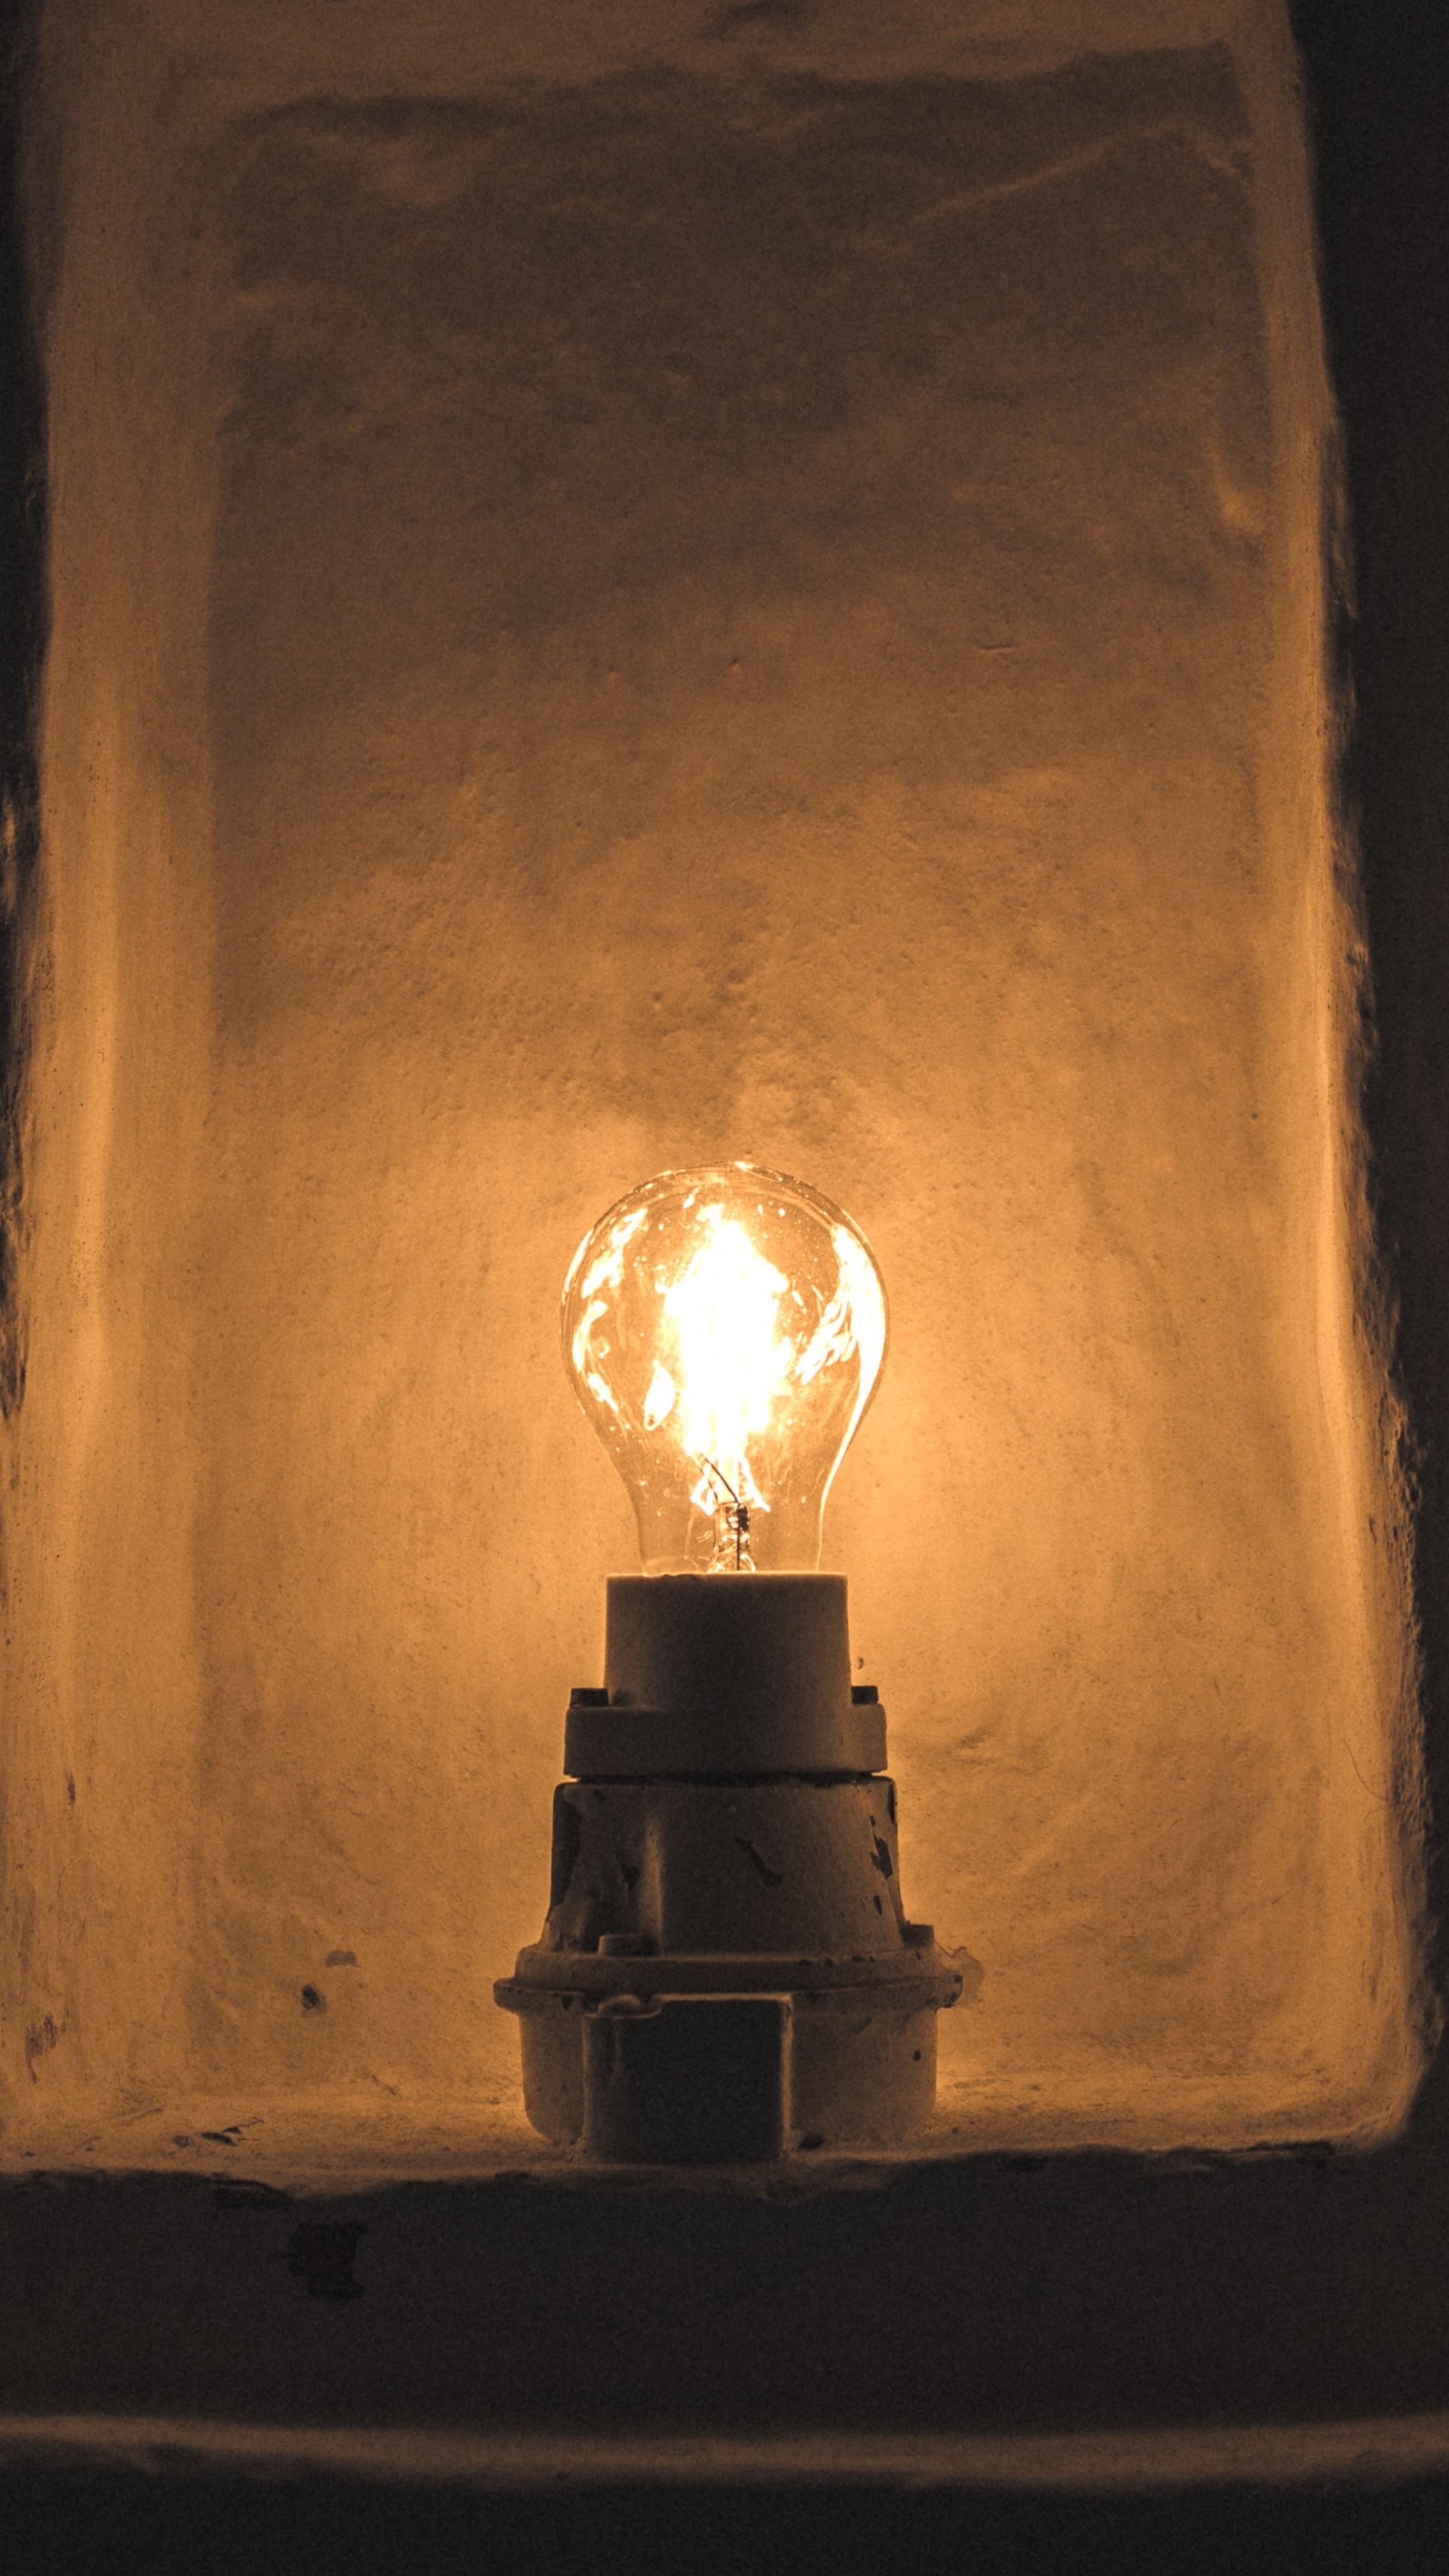 Lamp Lighter Lighting Wall Wallpaper